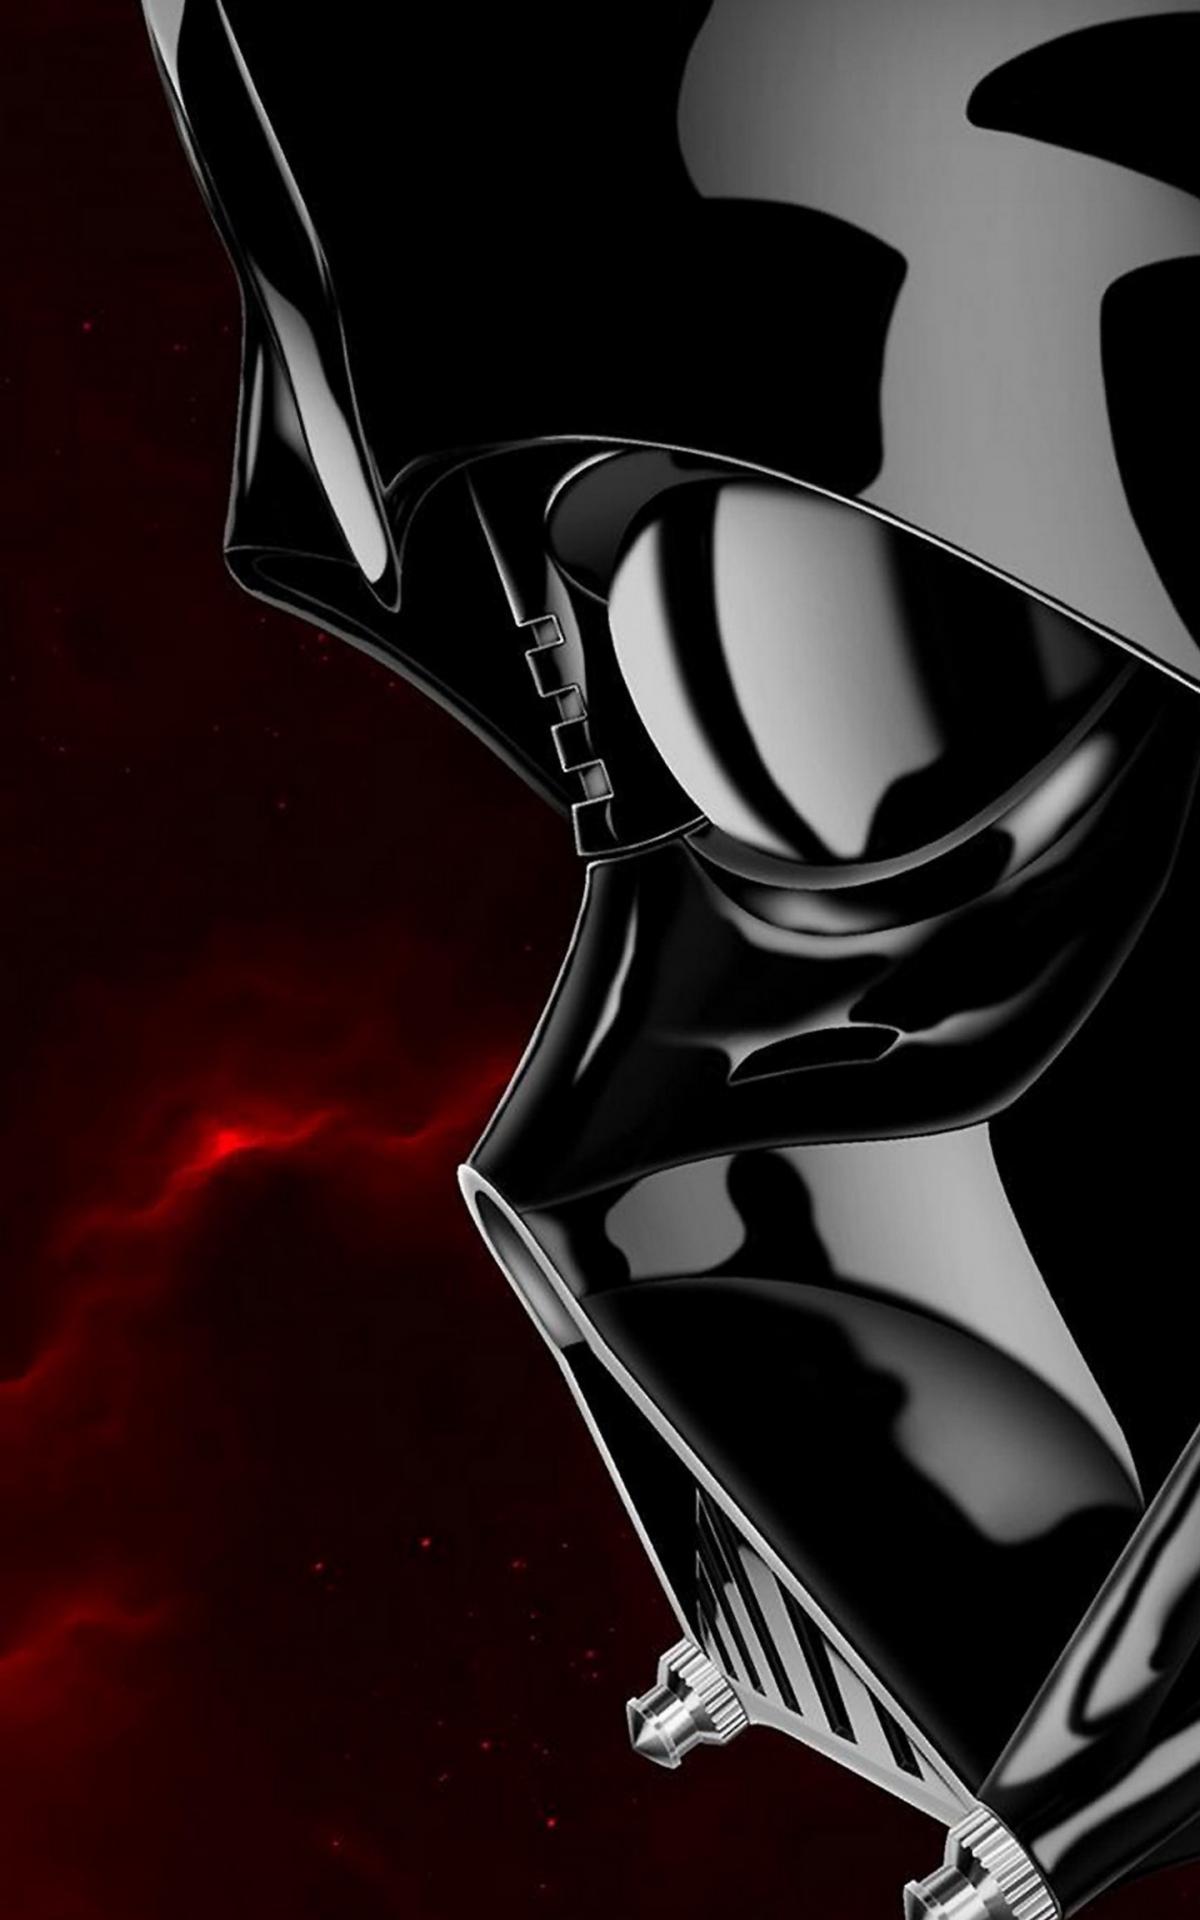 Free Download Darth Vader Star Wars Illustration Lock Screen